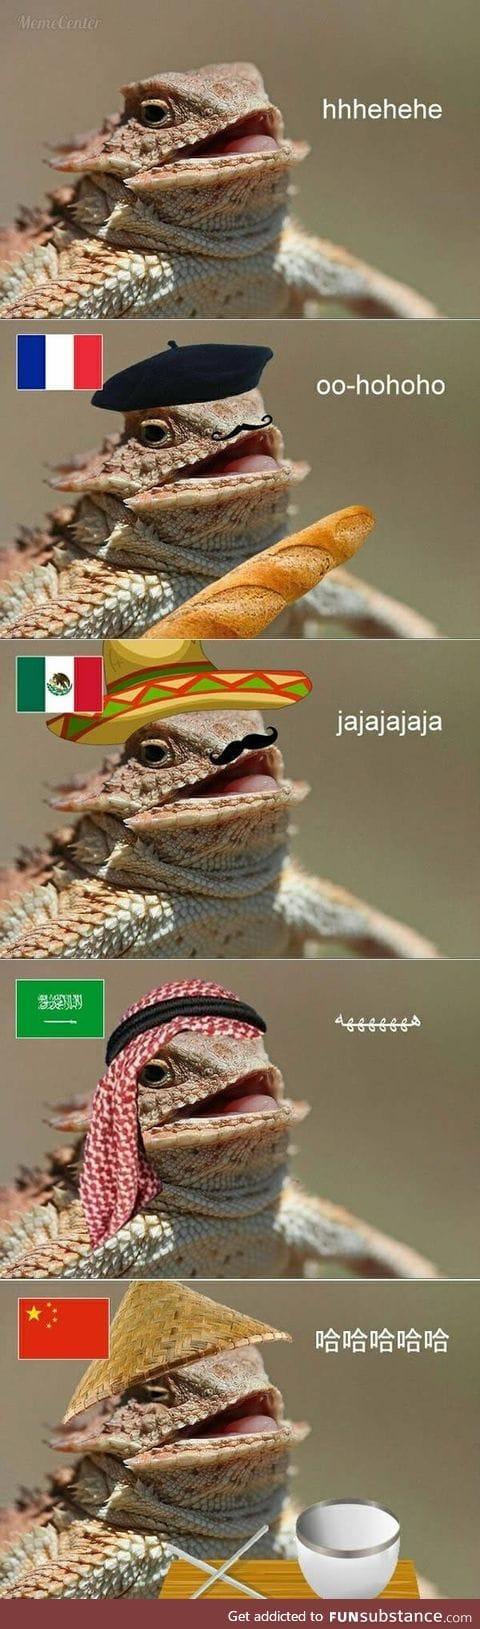 Hehehehhe